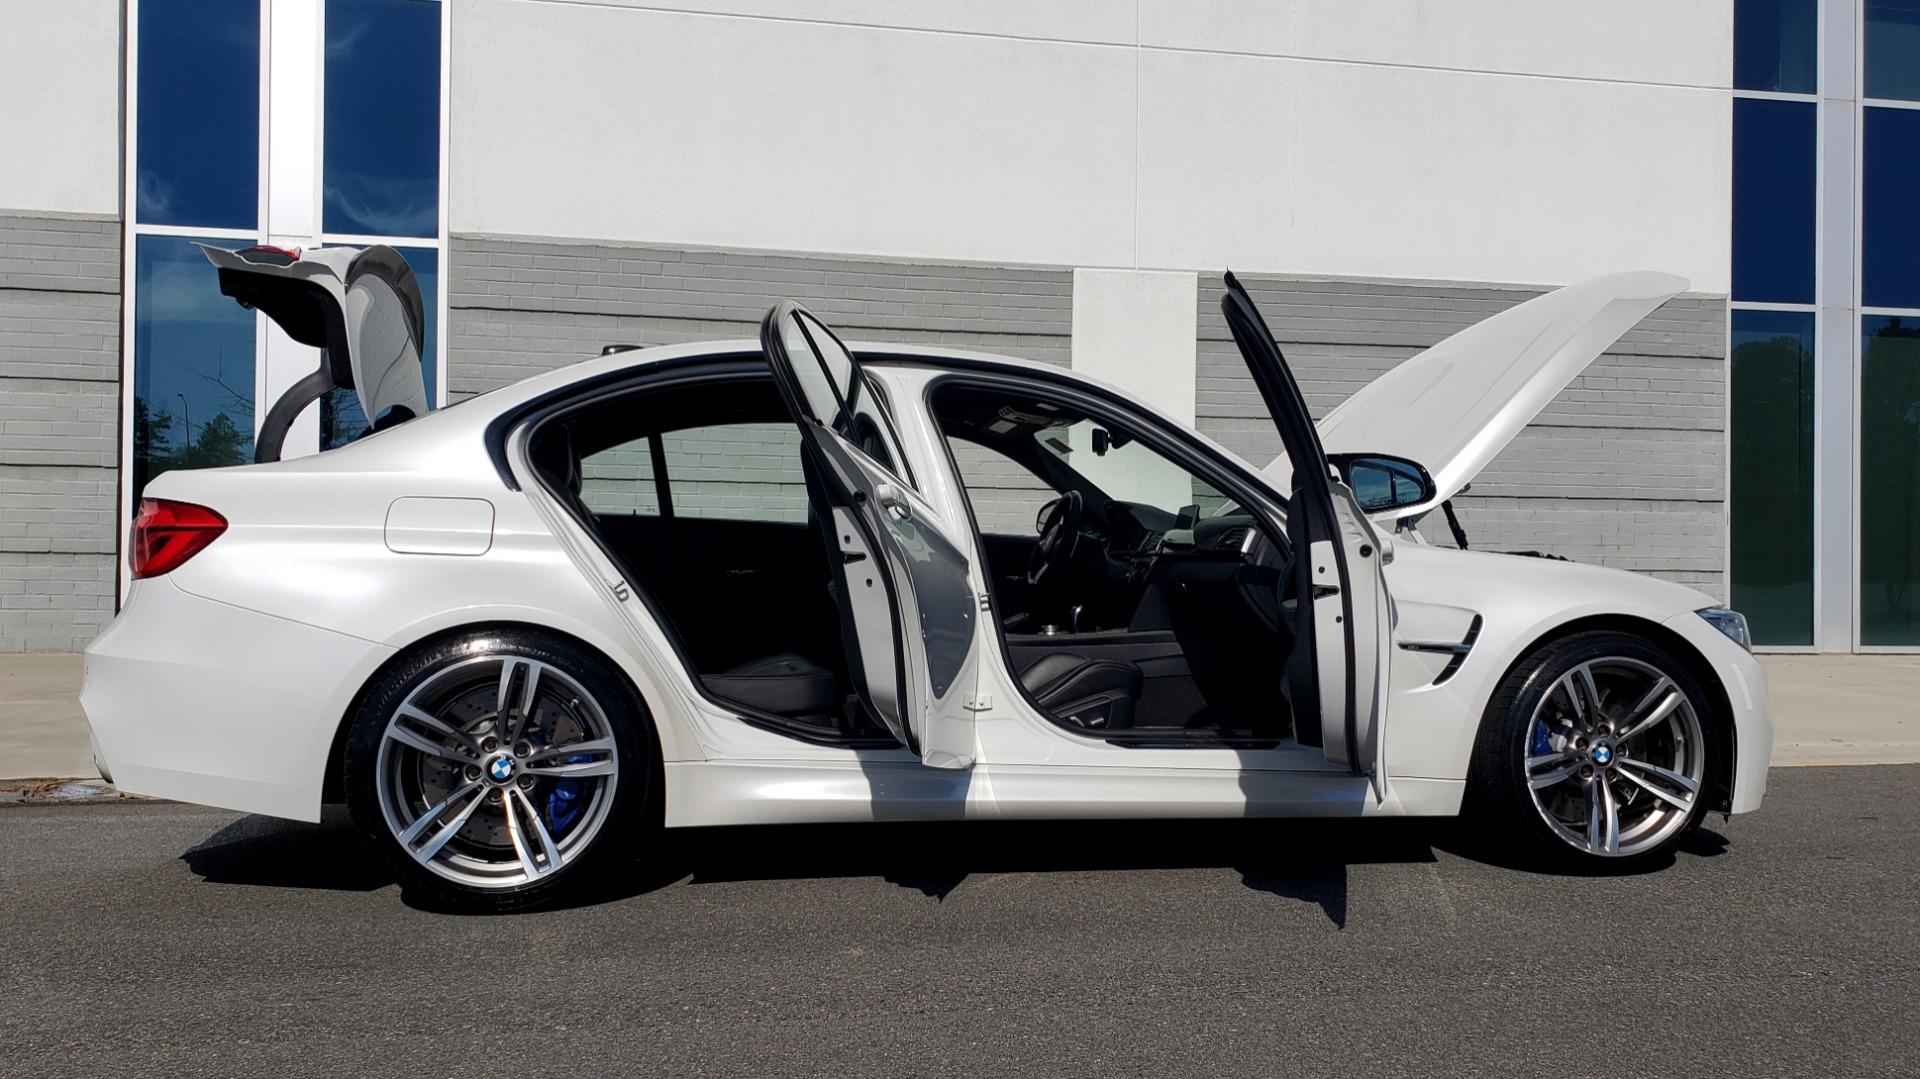 Used 2016 BMW M3 SEDAN / EXECUTIVE PKG / M-SUSPENSION / HARMAN/KARDON SOUND for sale Sold at Formula Imports in Charlotte NC 28227 22